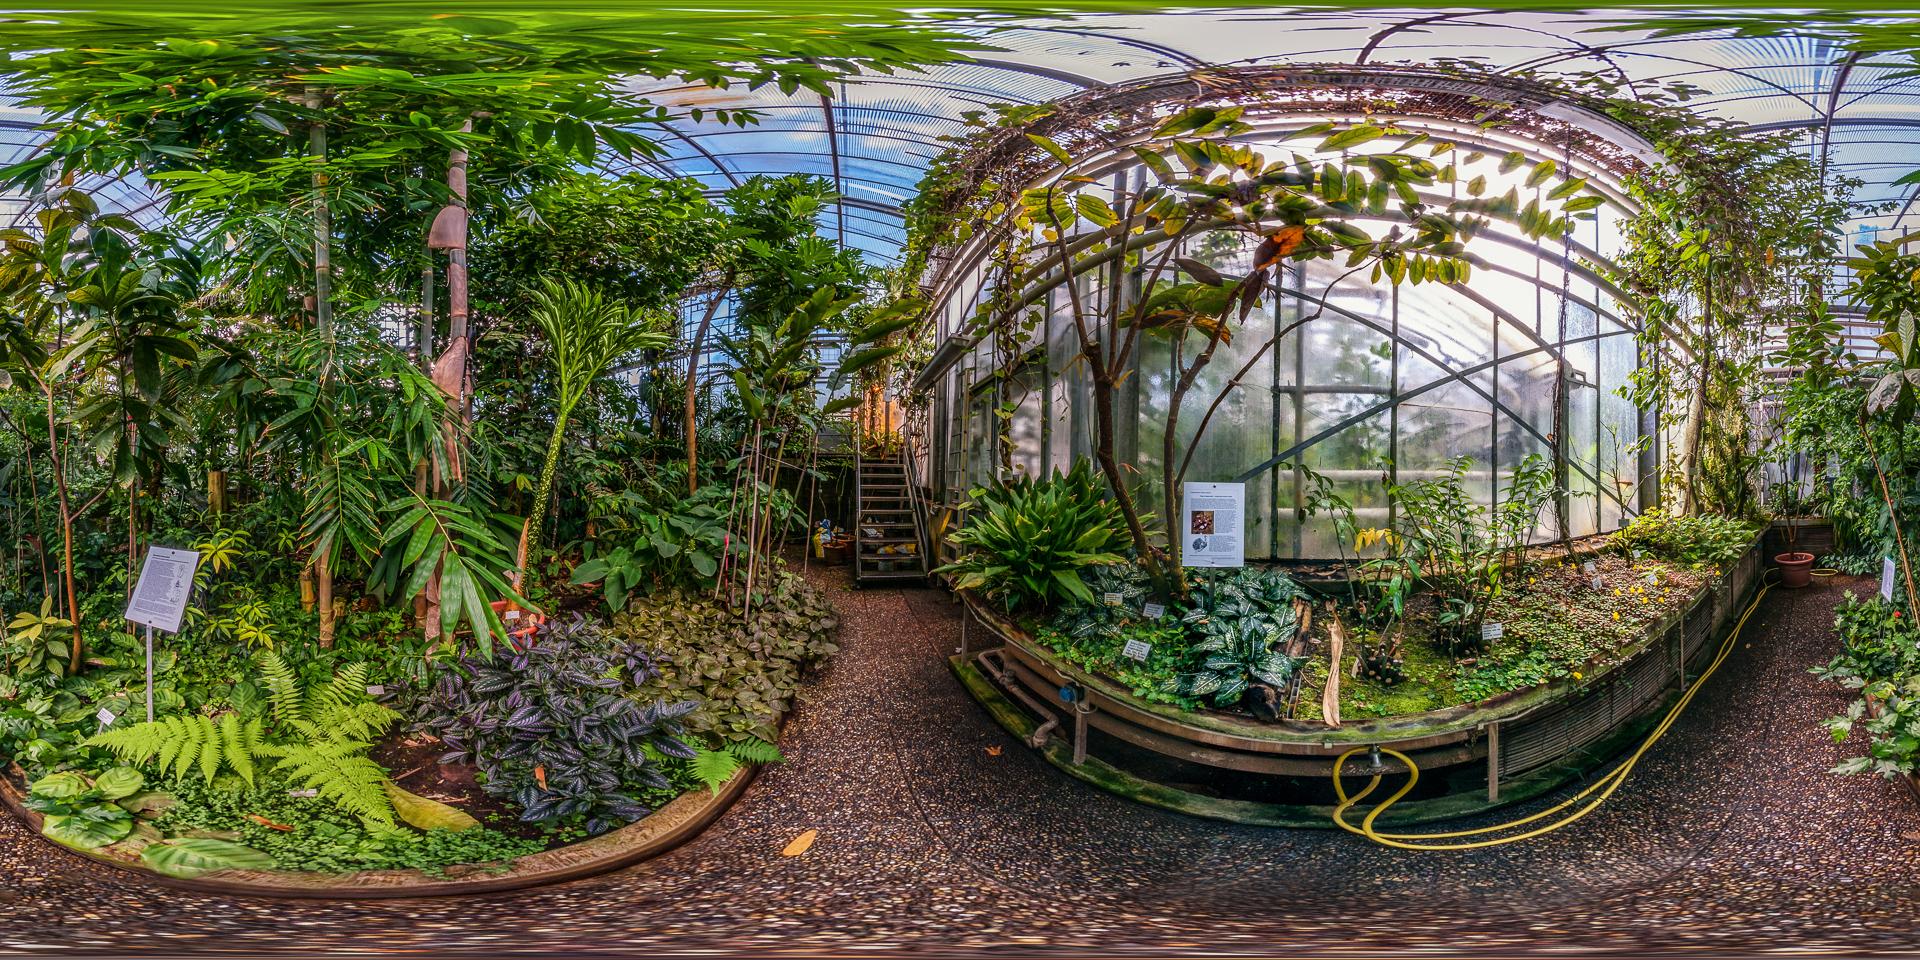 Botanischer-Garten-Darmstadt-Tropenhaus